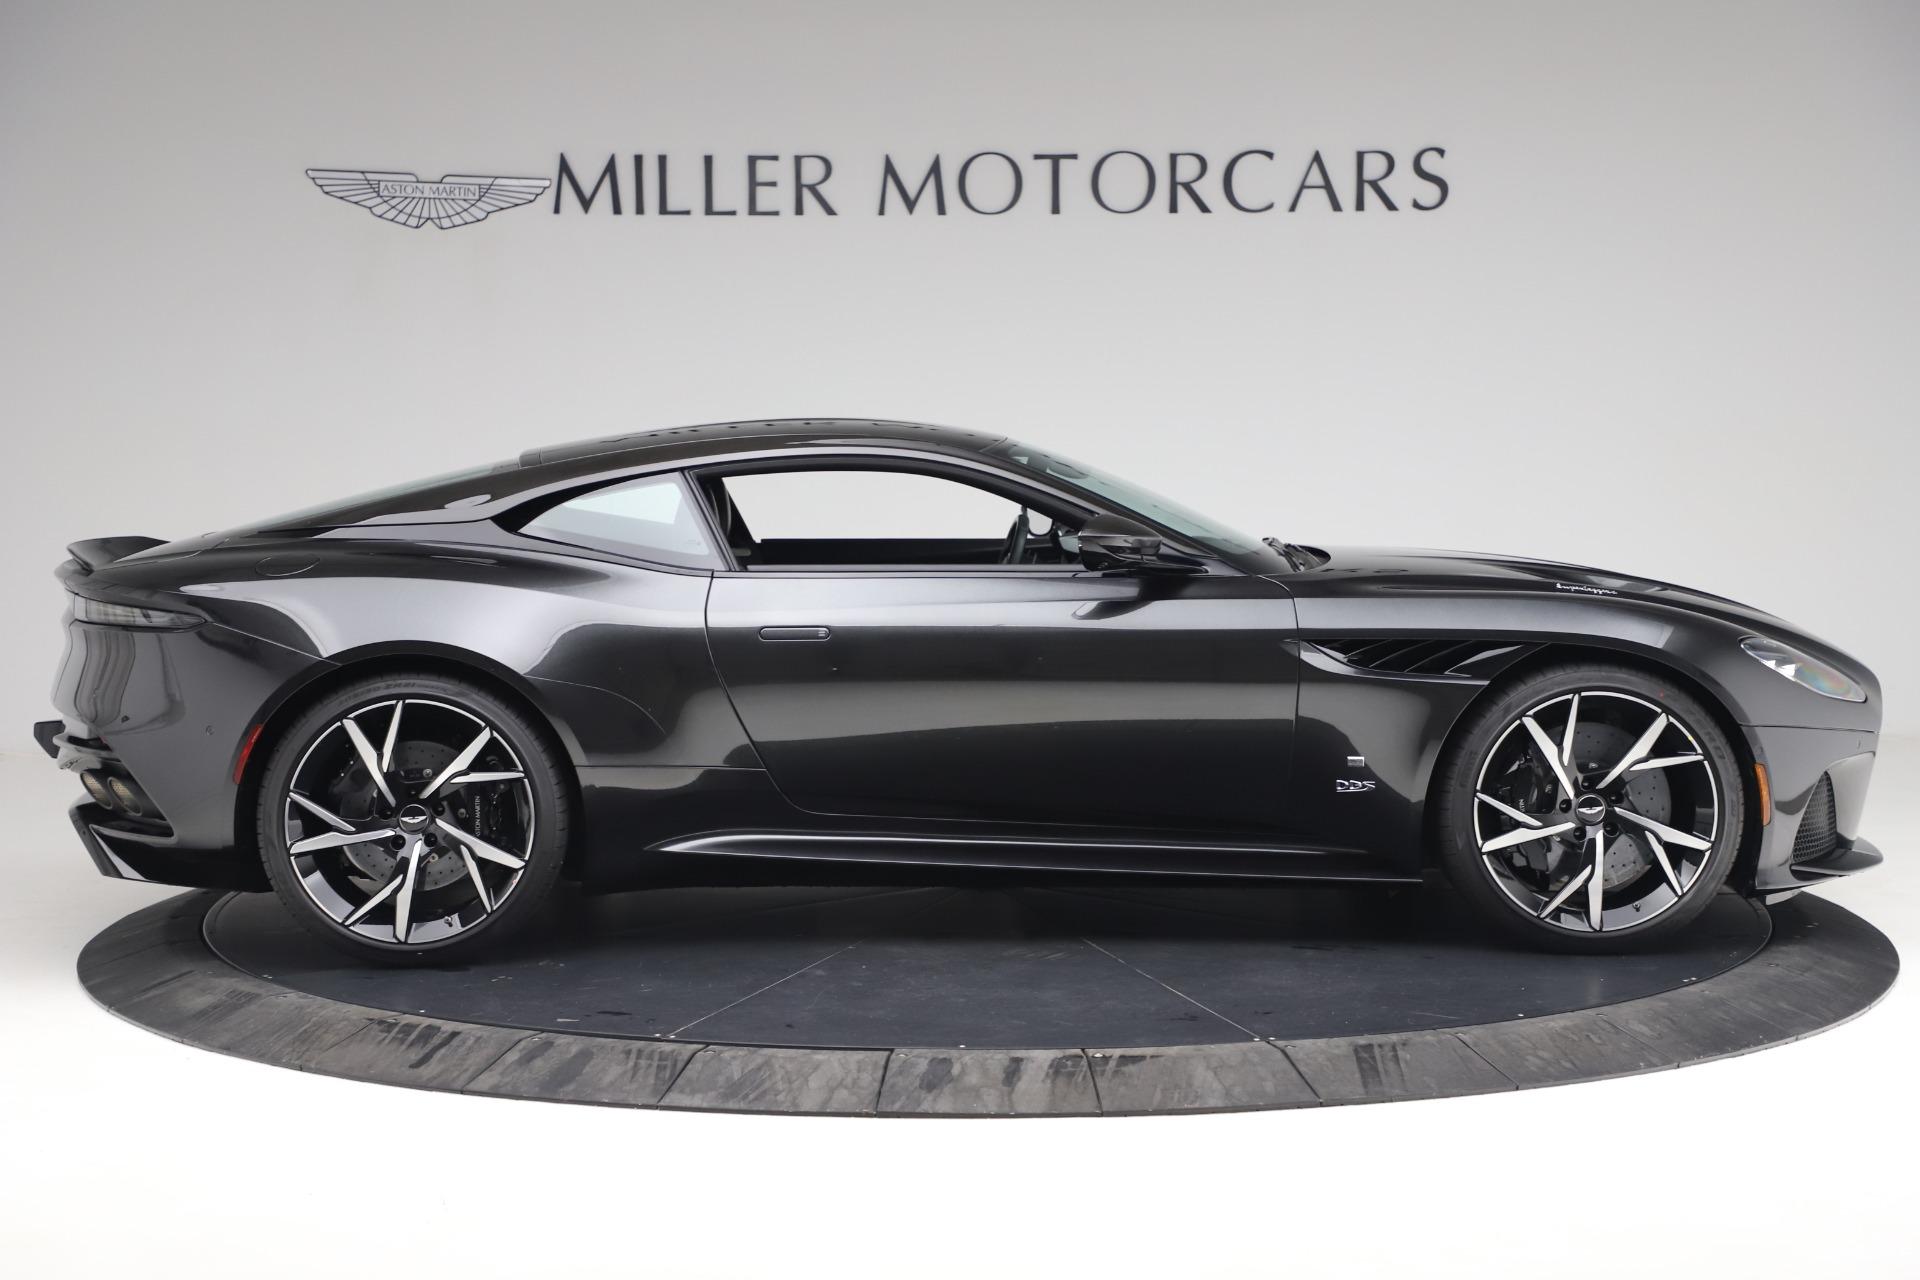 New 2021 Aston Martin DBS Superleggera 007